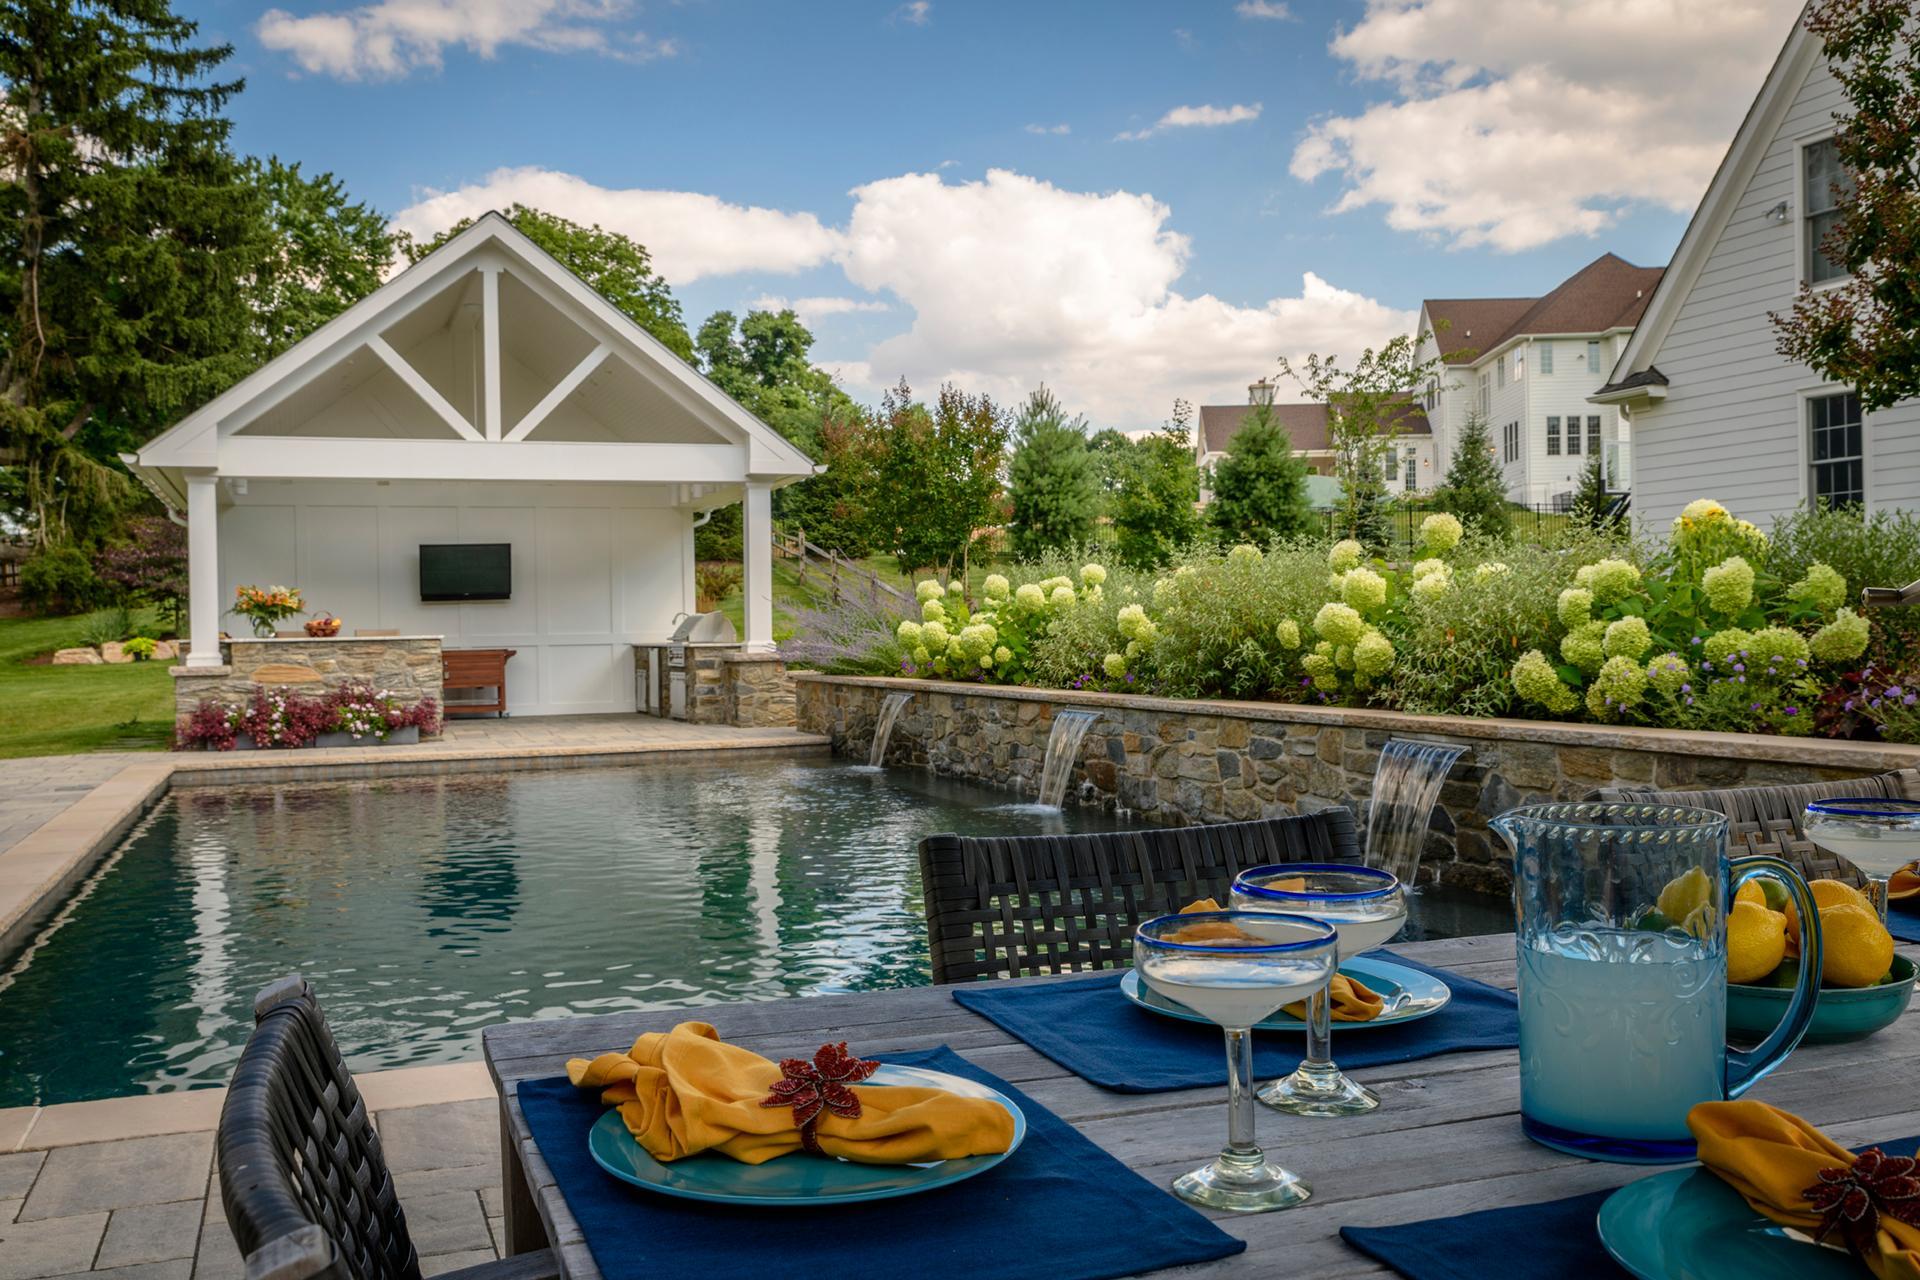 main-line-pa-wayne-outdoor-dining-alresco-pool-design-ideas